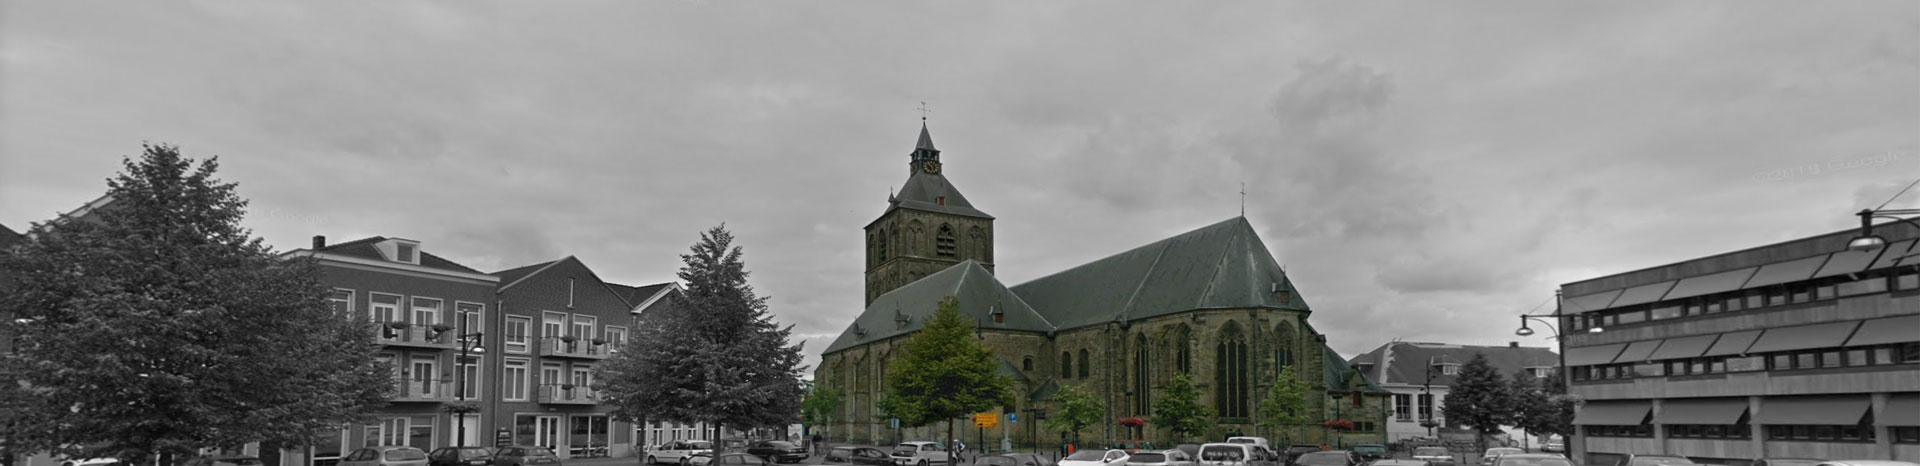 Letselschade advocaat Oldenzaal | LetselPro